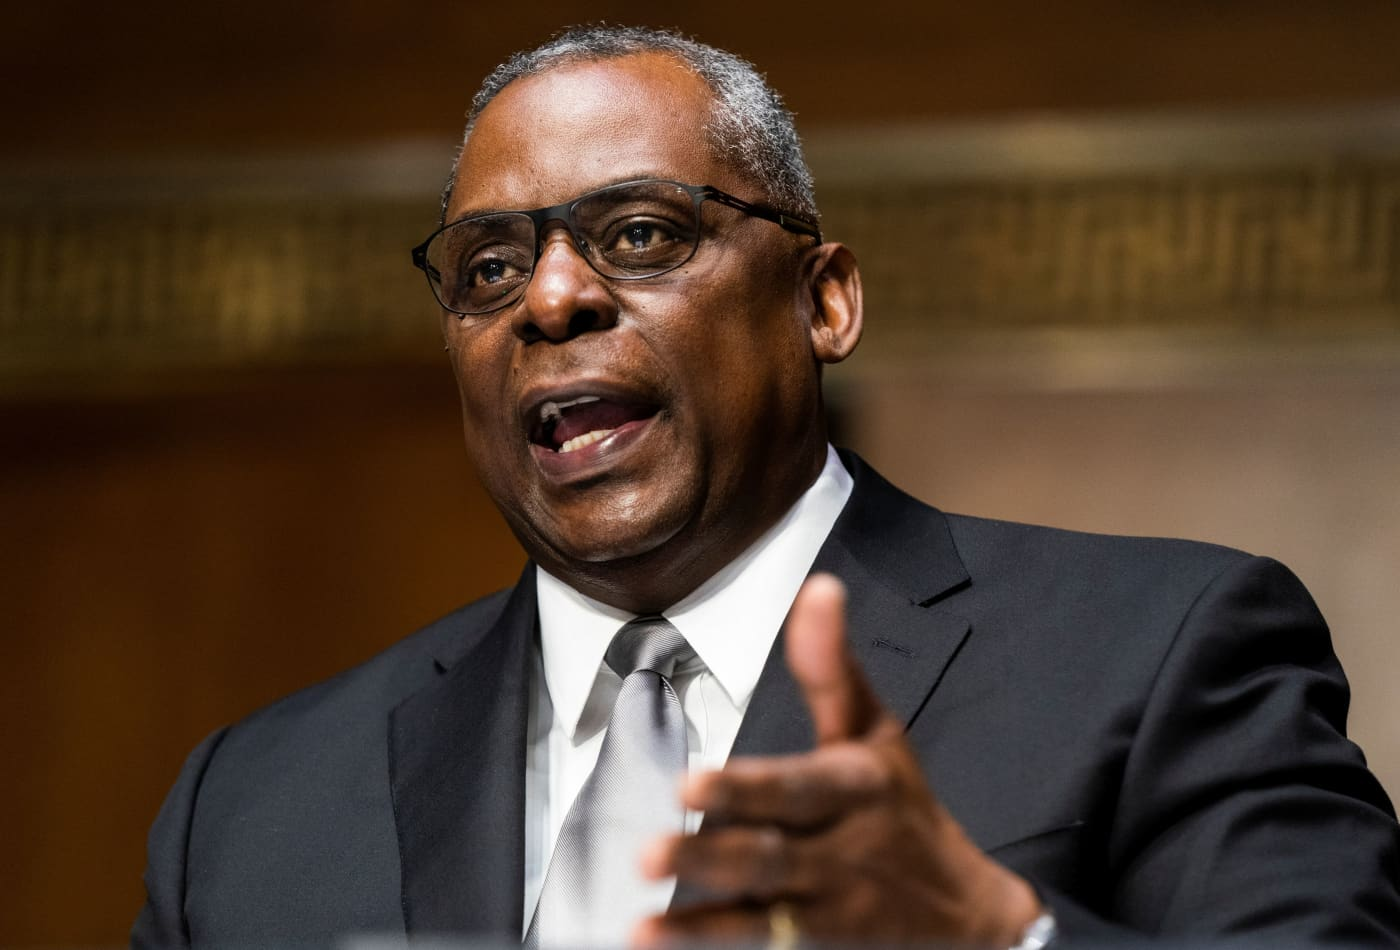 Senate confirms Lloyd Austin as America's first Black secretary of Defense